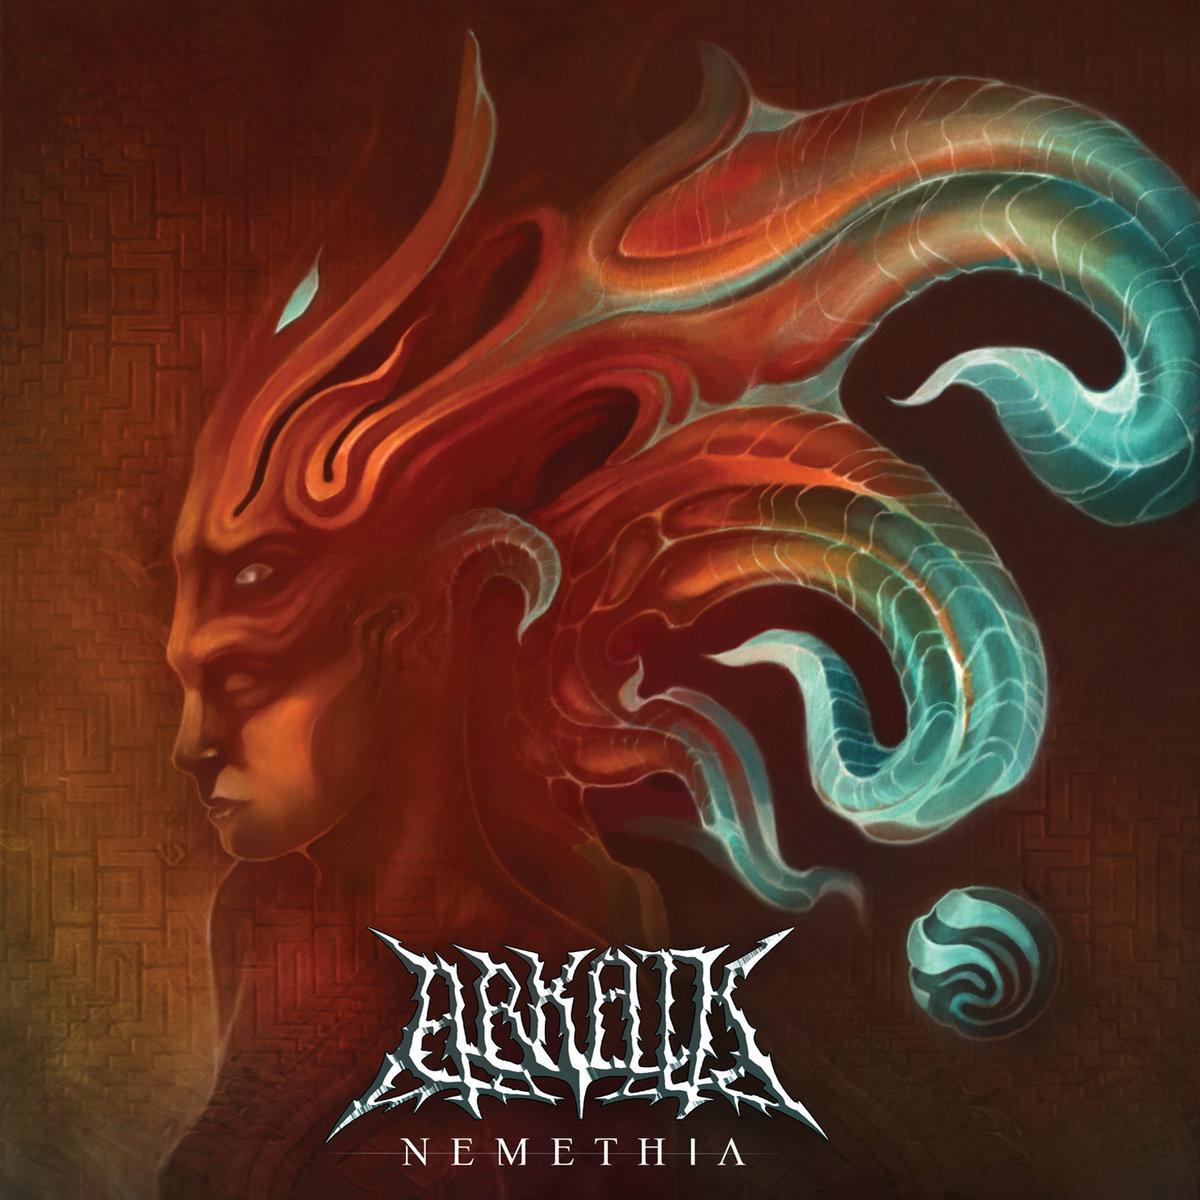 Arkaik - Nemethia